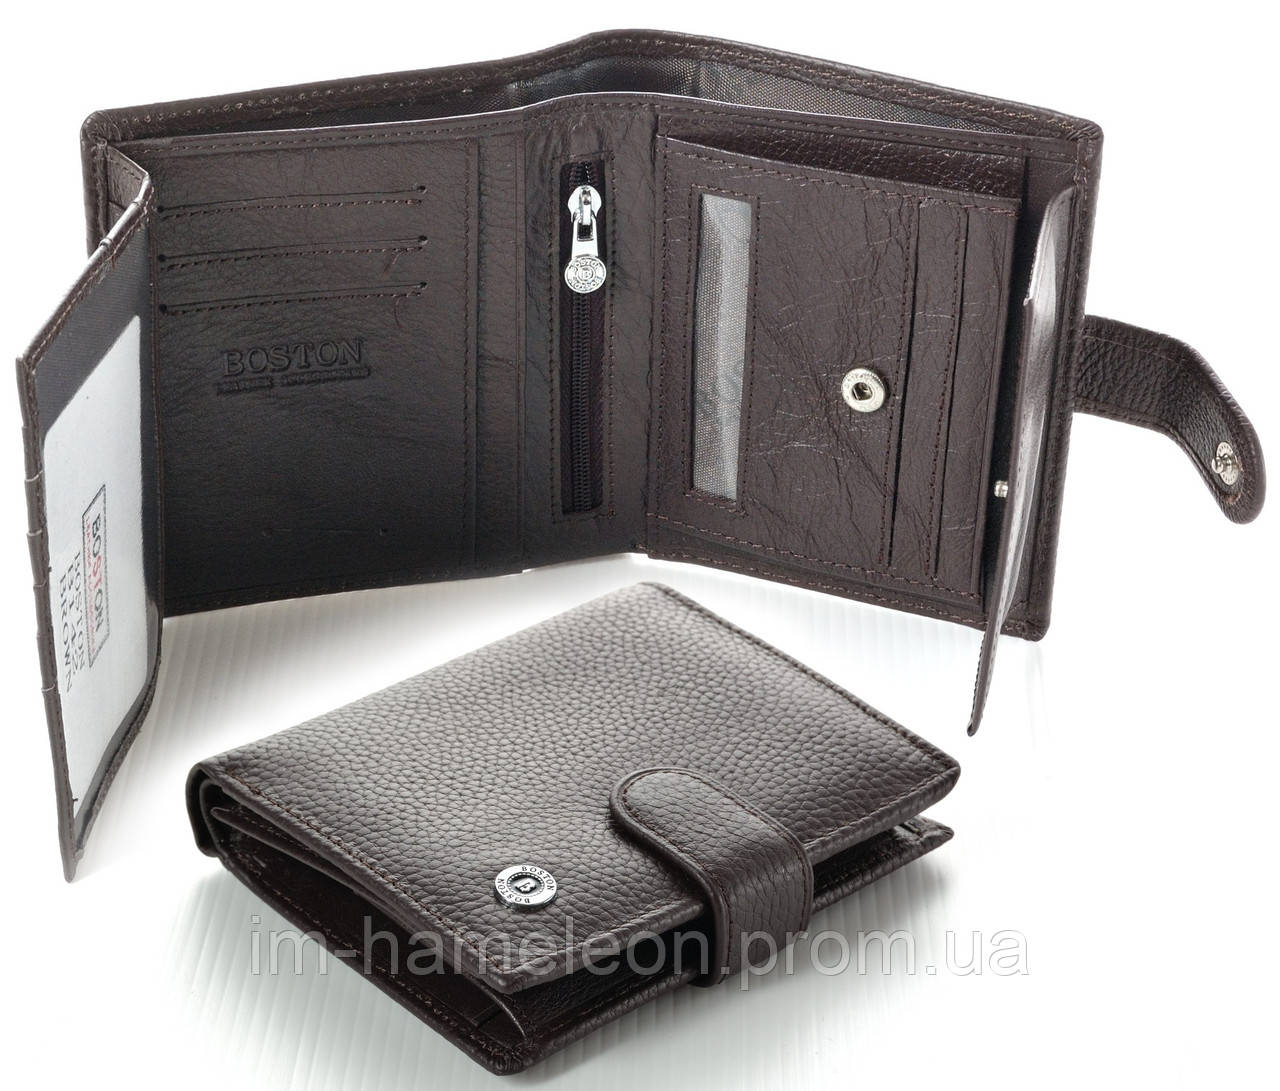 02f2810b57b4 Мужской кожаный кошелек Boston коричневый - Интернет-магазин